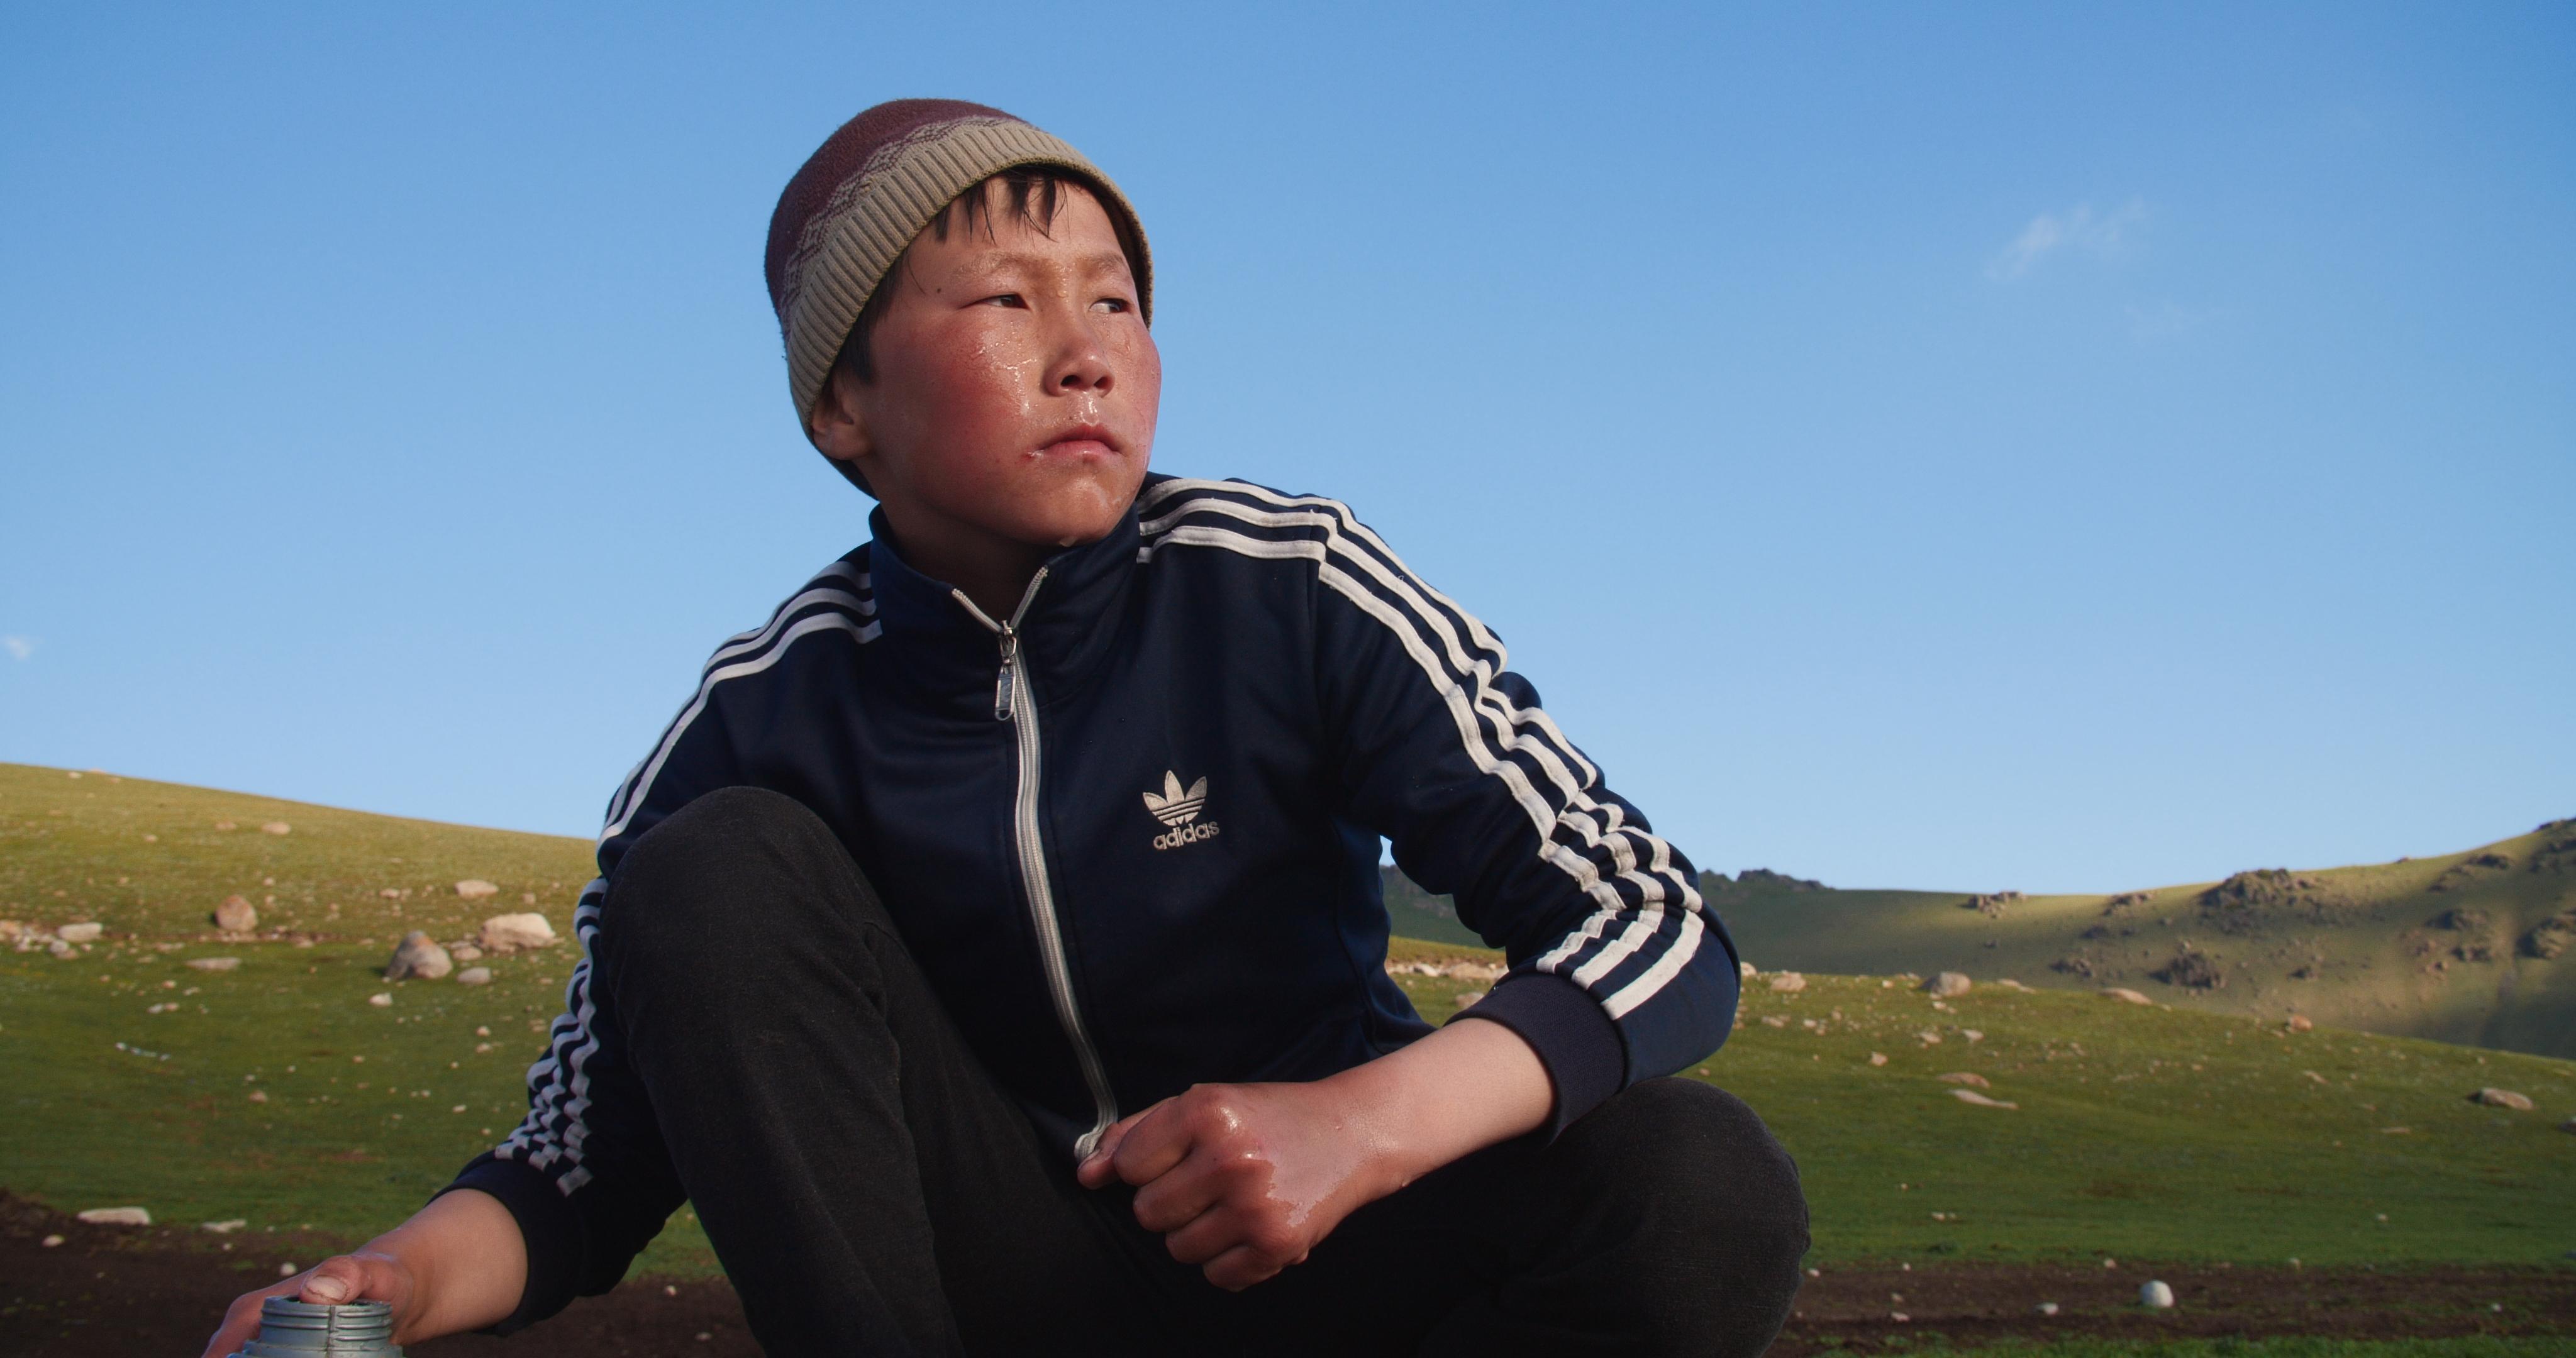 TheBoyFromKyrgyzstan_Stills_1.10.3